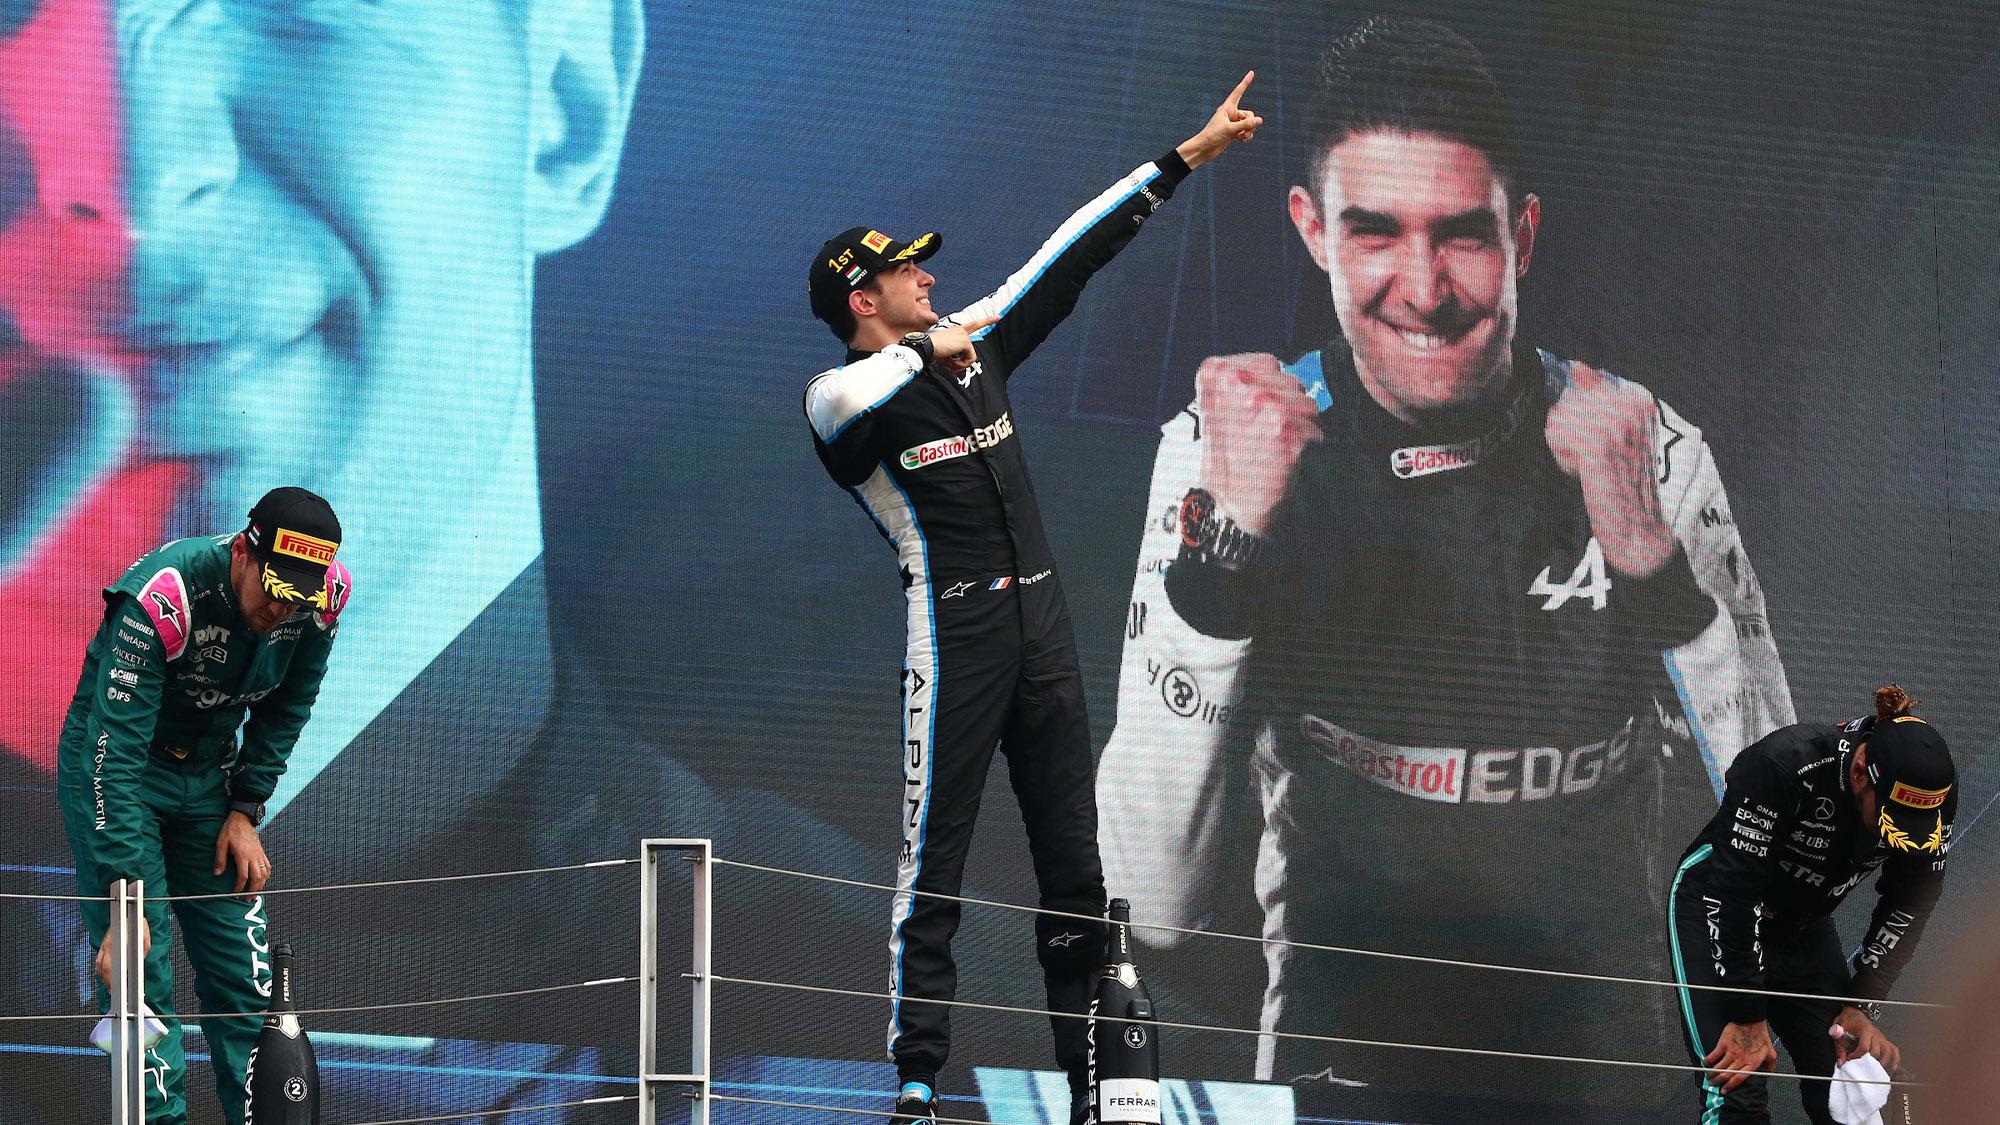 Esteban Ocon on the podium after winning the 2021 Hungarian Grand Prix